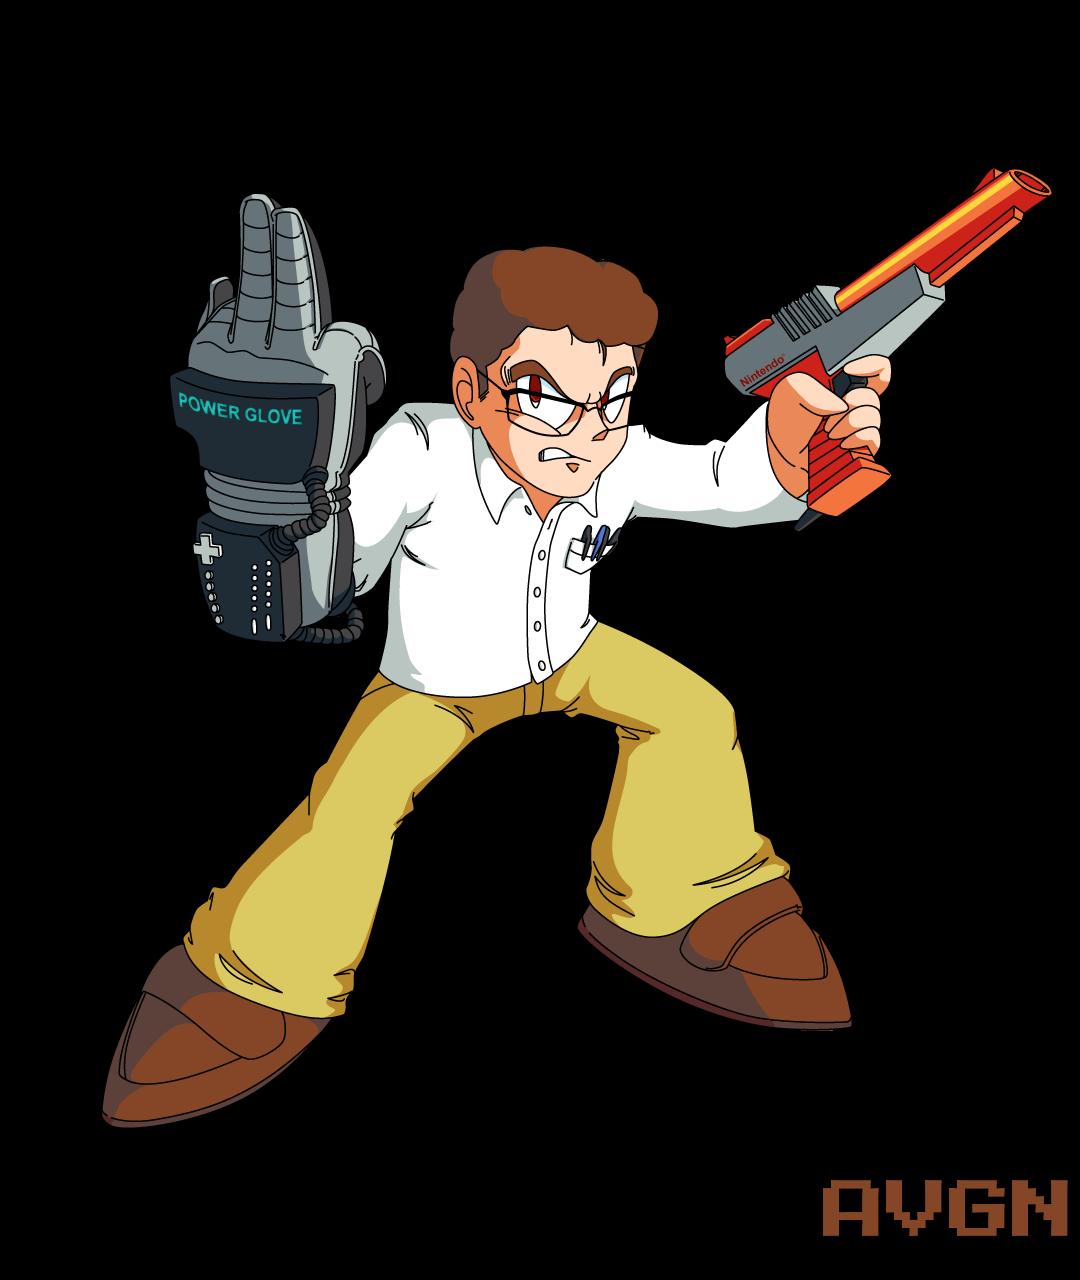 Dennis the Menace (SNES) - Angry Video Game Nerd (AVGN ...